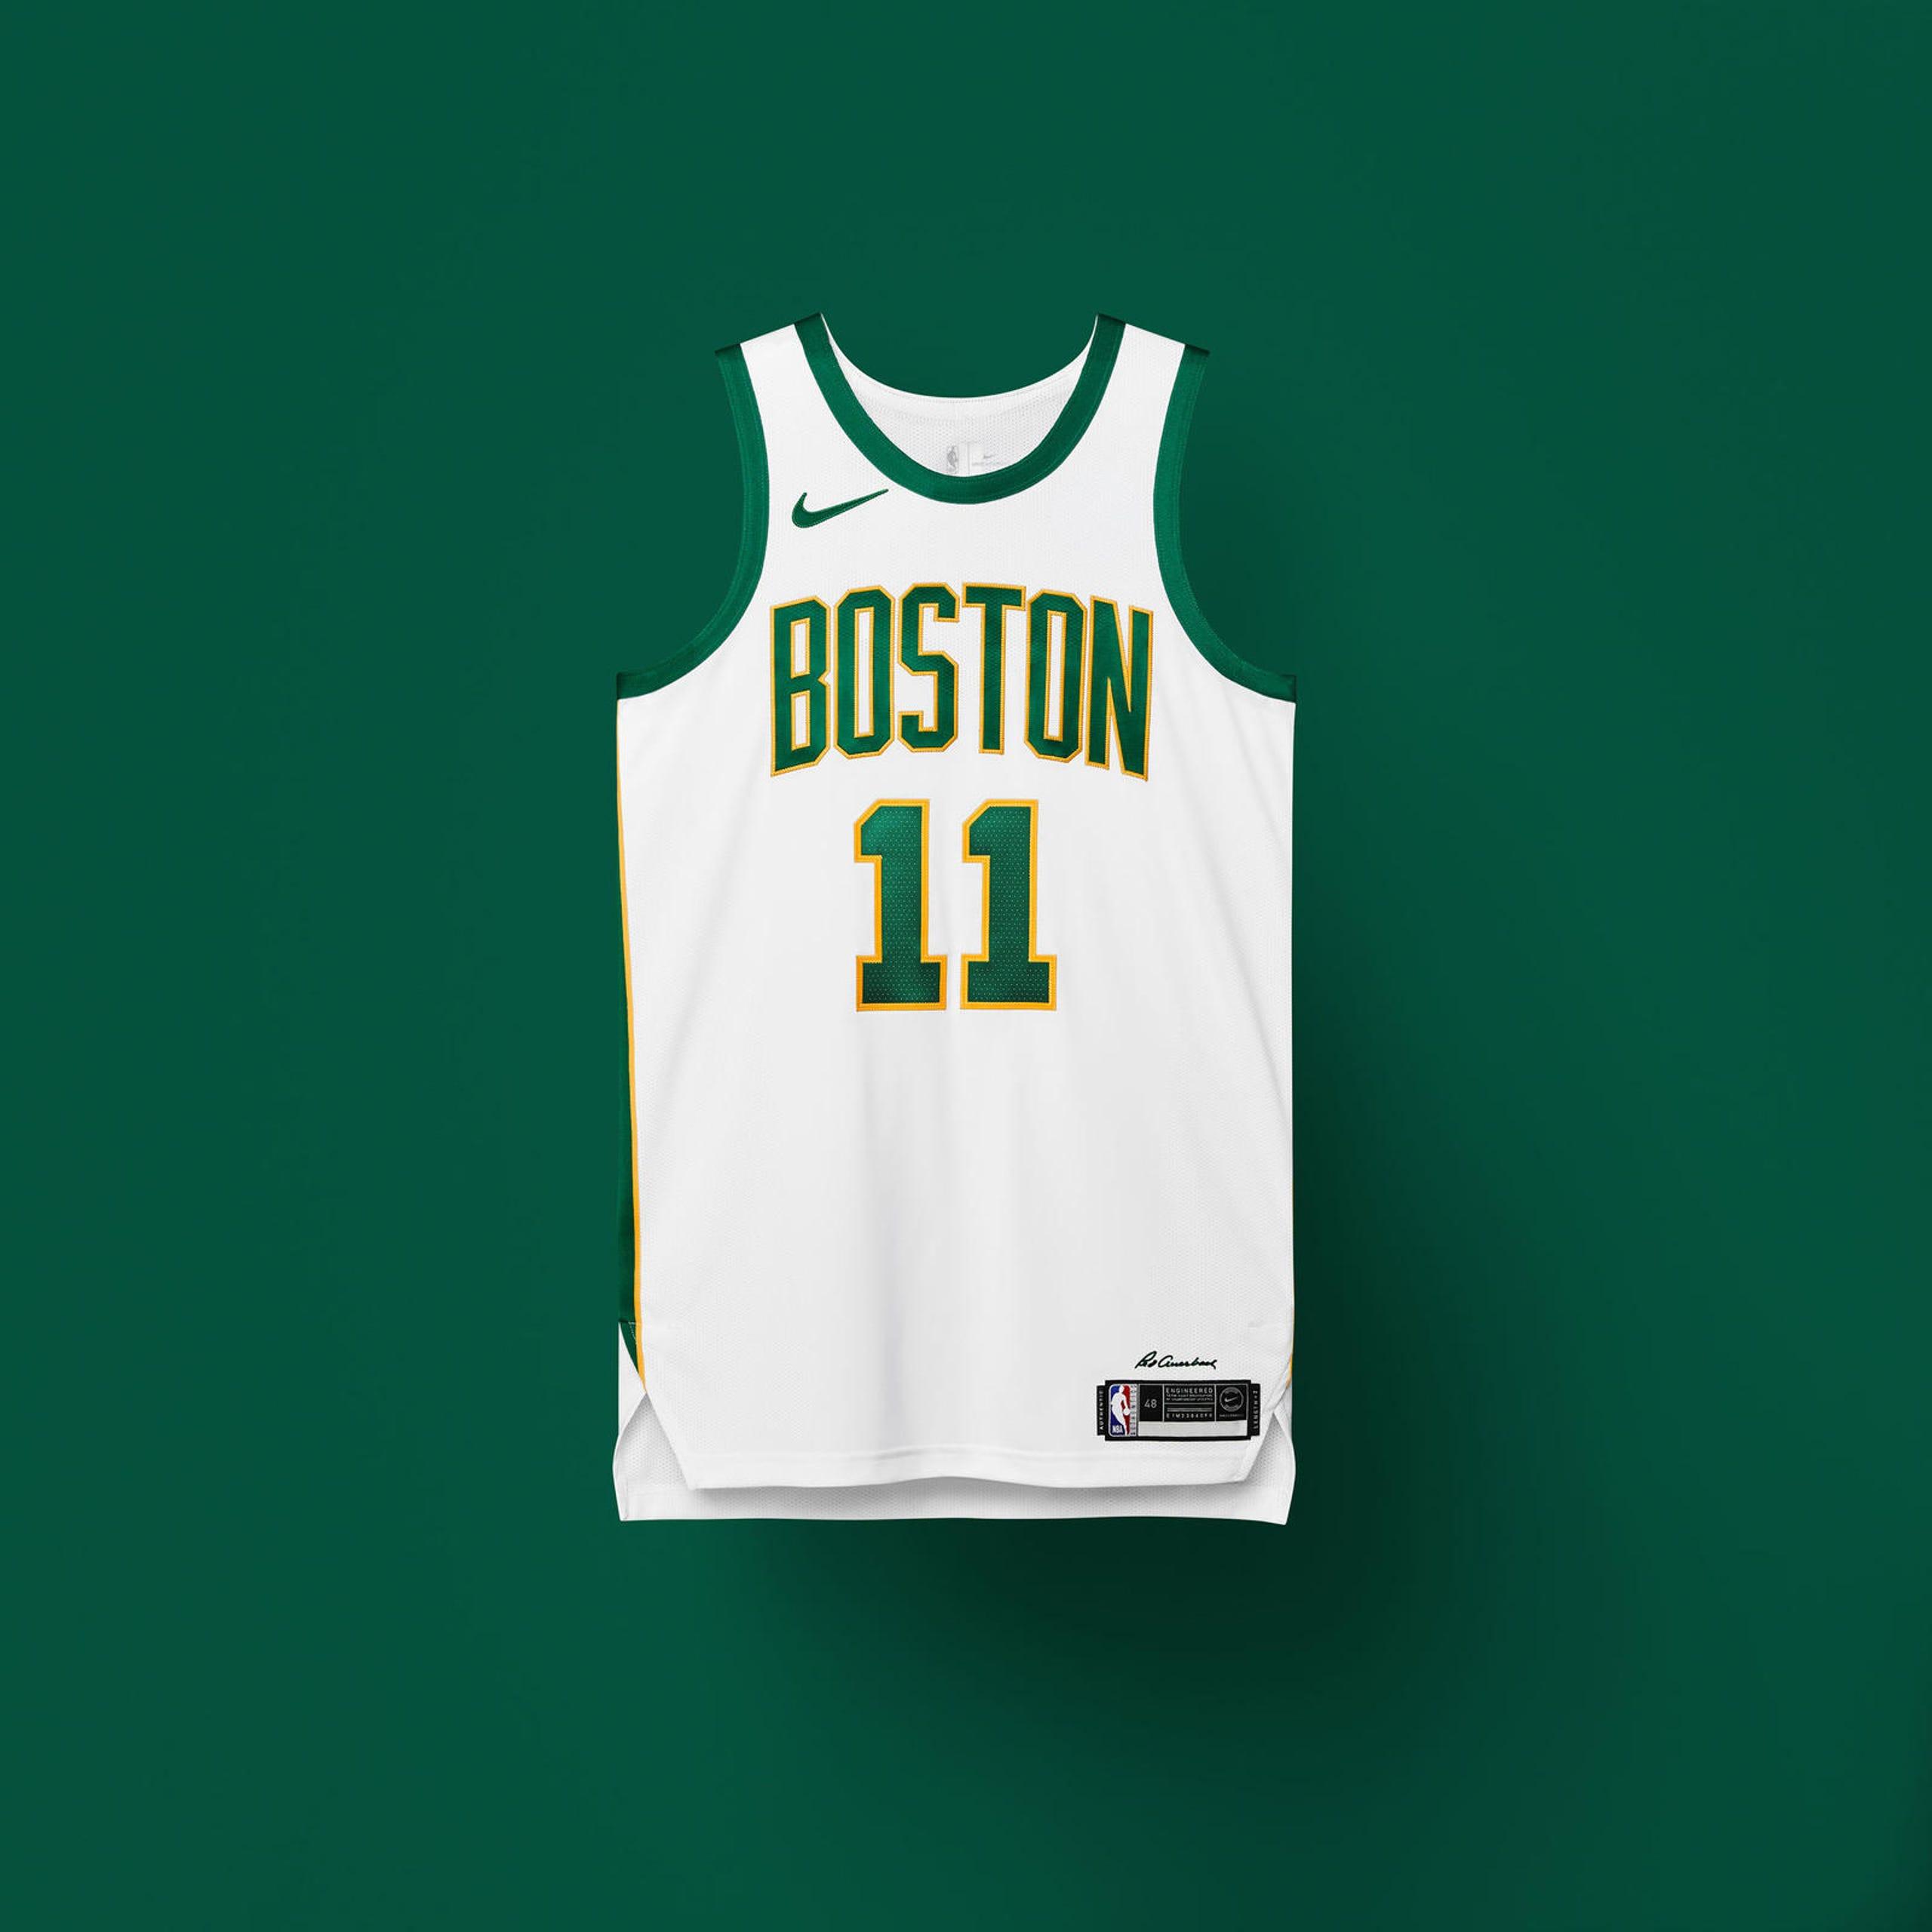 nba city edition jerseys 2018-19